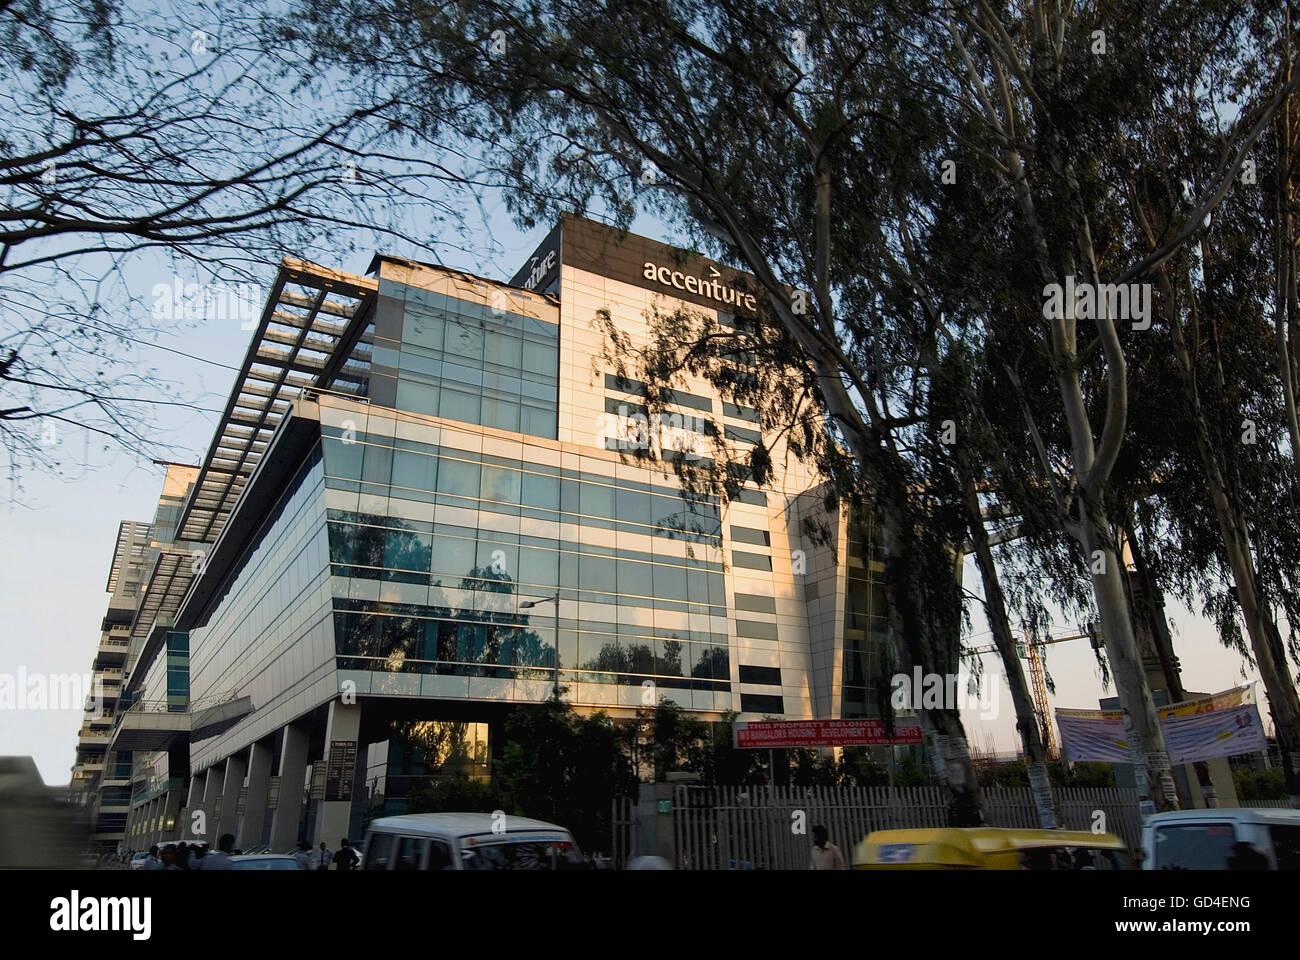 Accenture Bangalore Stock Photos & Accenture Bangalore Stock